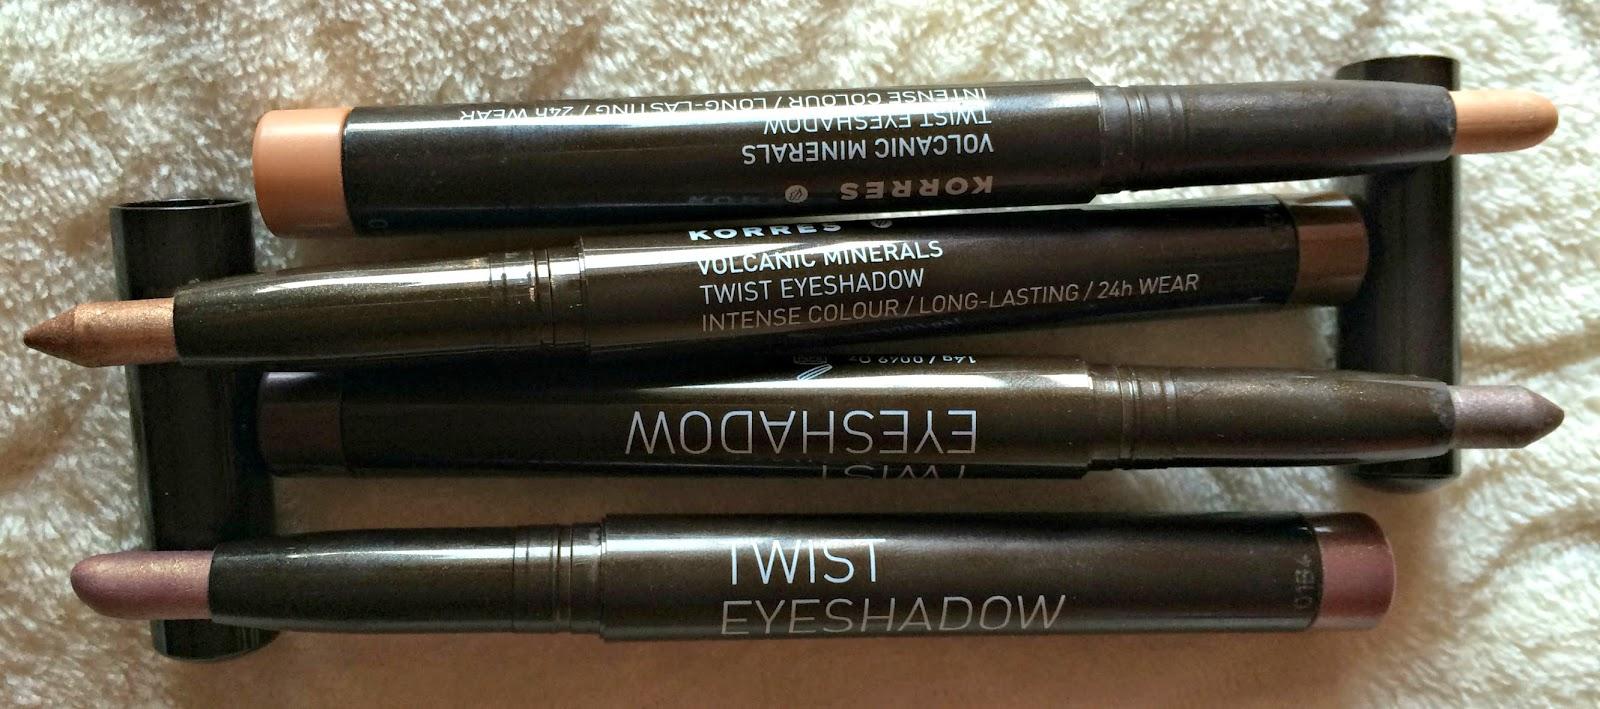 review & swatches Korres volcanic minerals twist eyeshadow